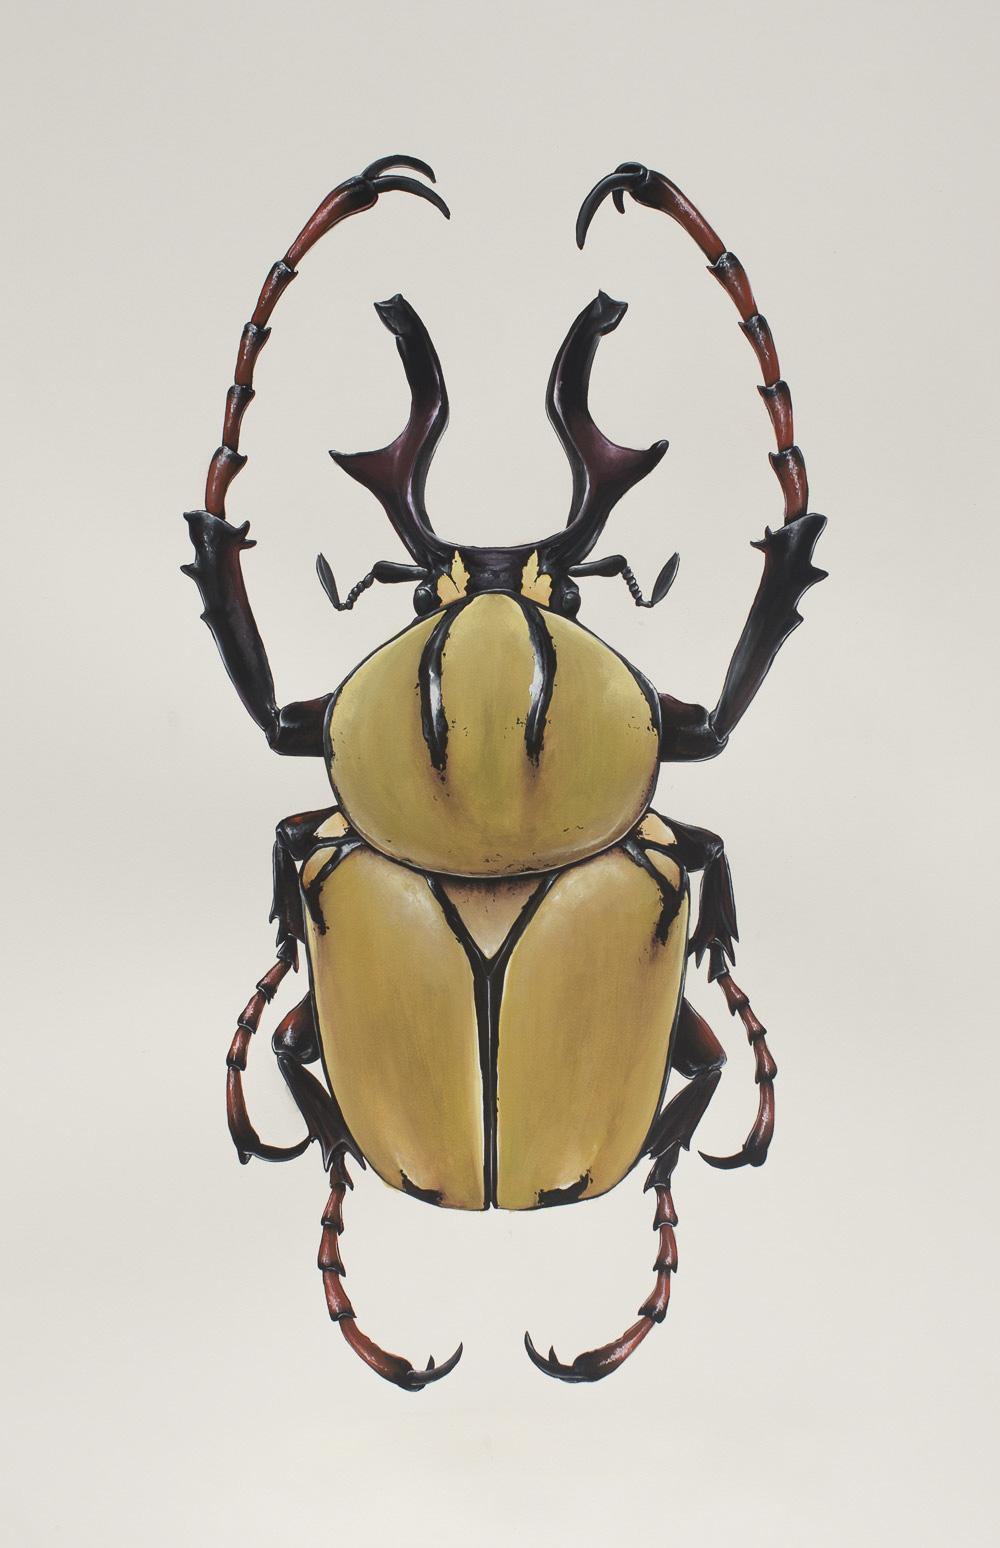 Thomas-Jackson---Entomology_dicranocephalus-wallichi_660x985.JPG